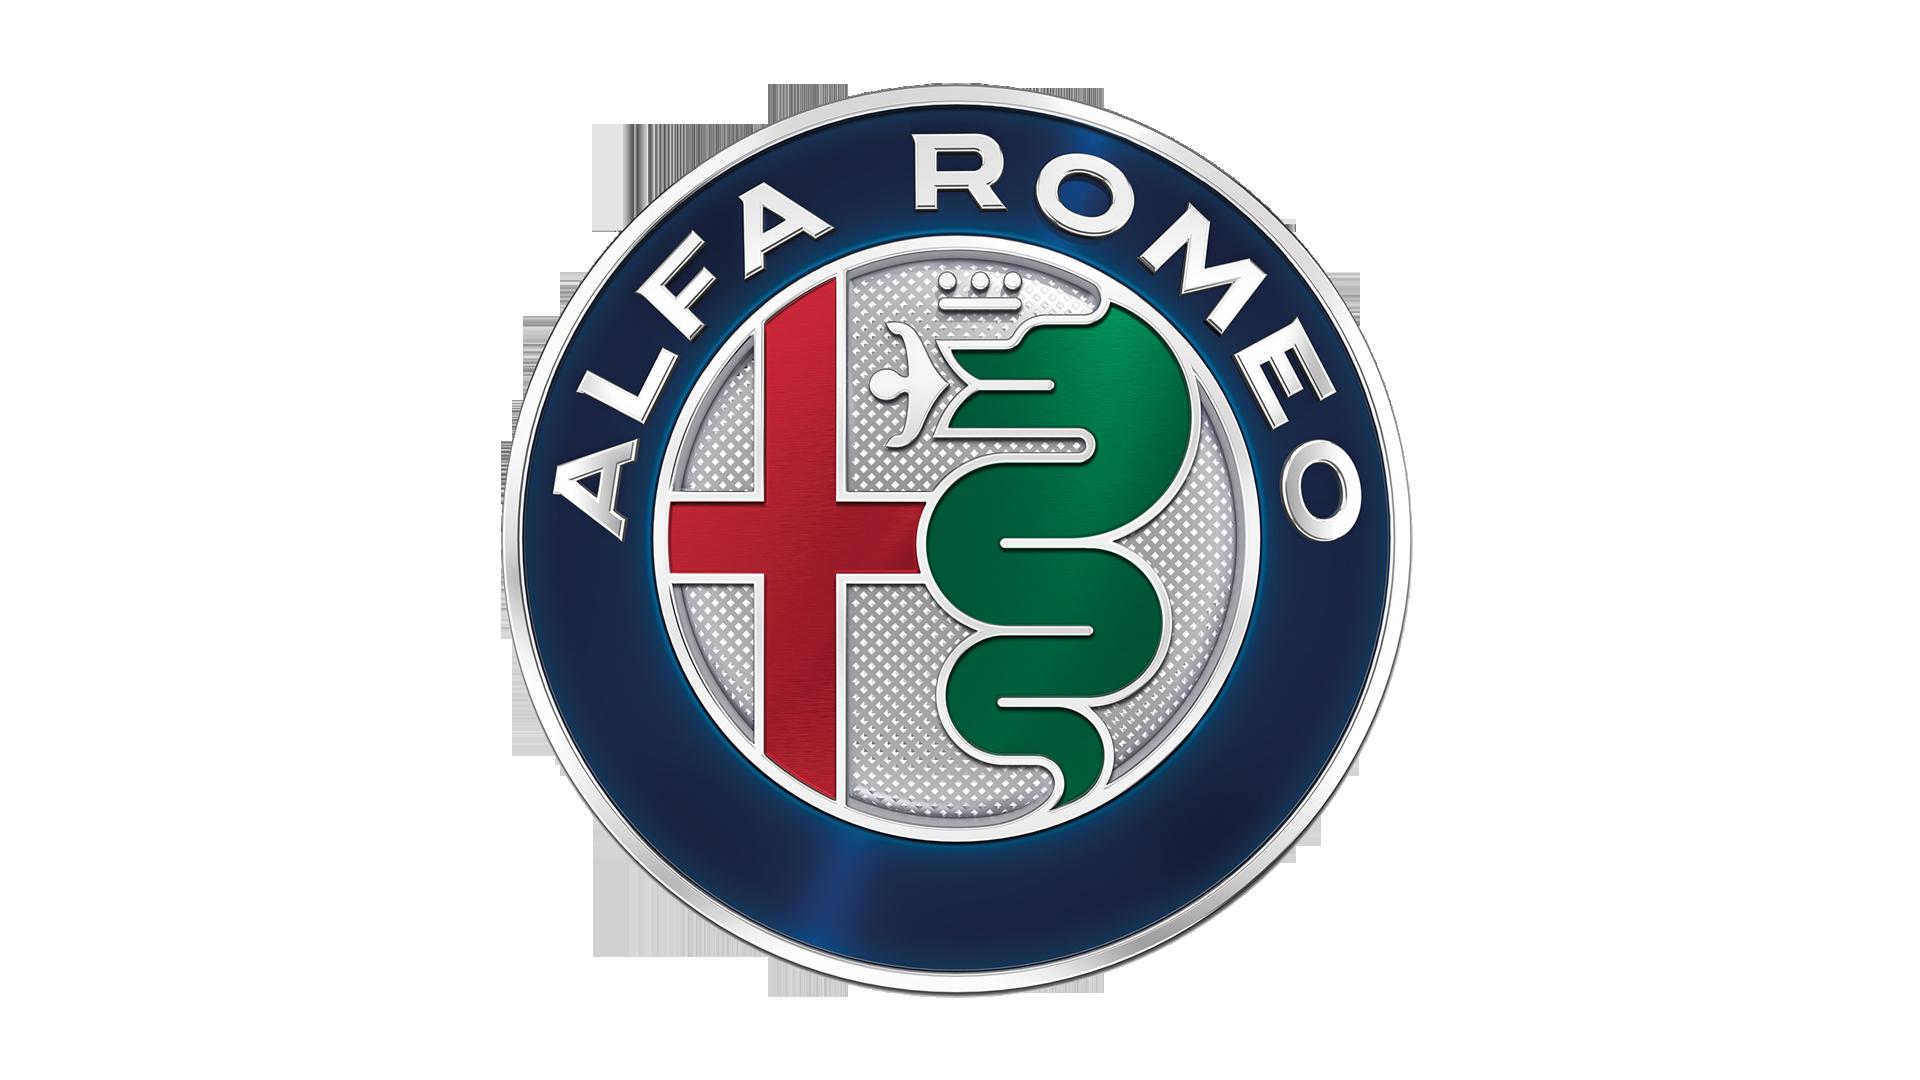 Alfa Romeo of Strongsville - Italian Car Manufacturer